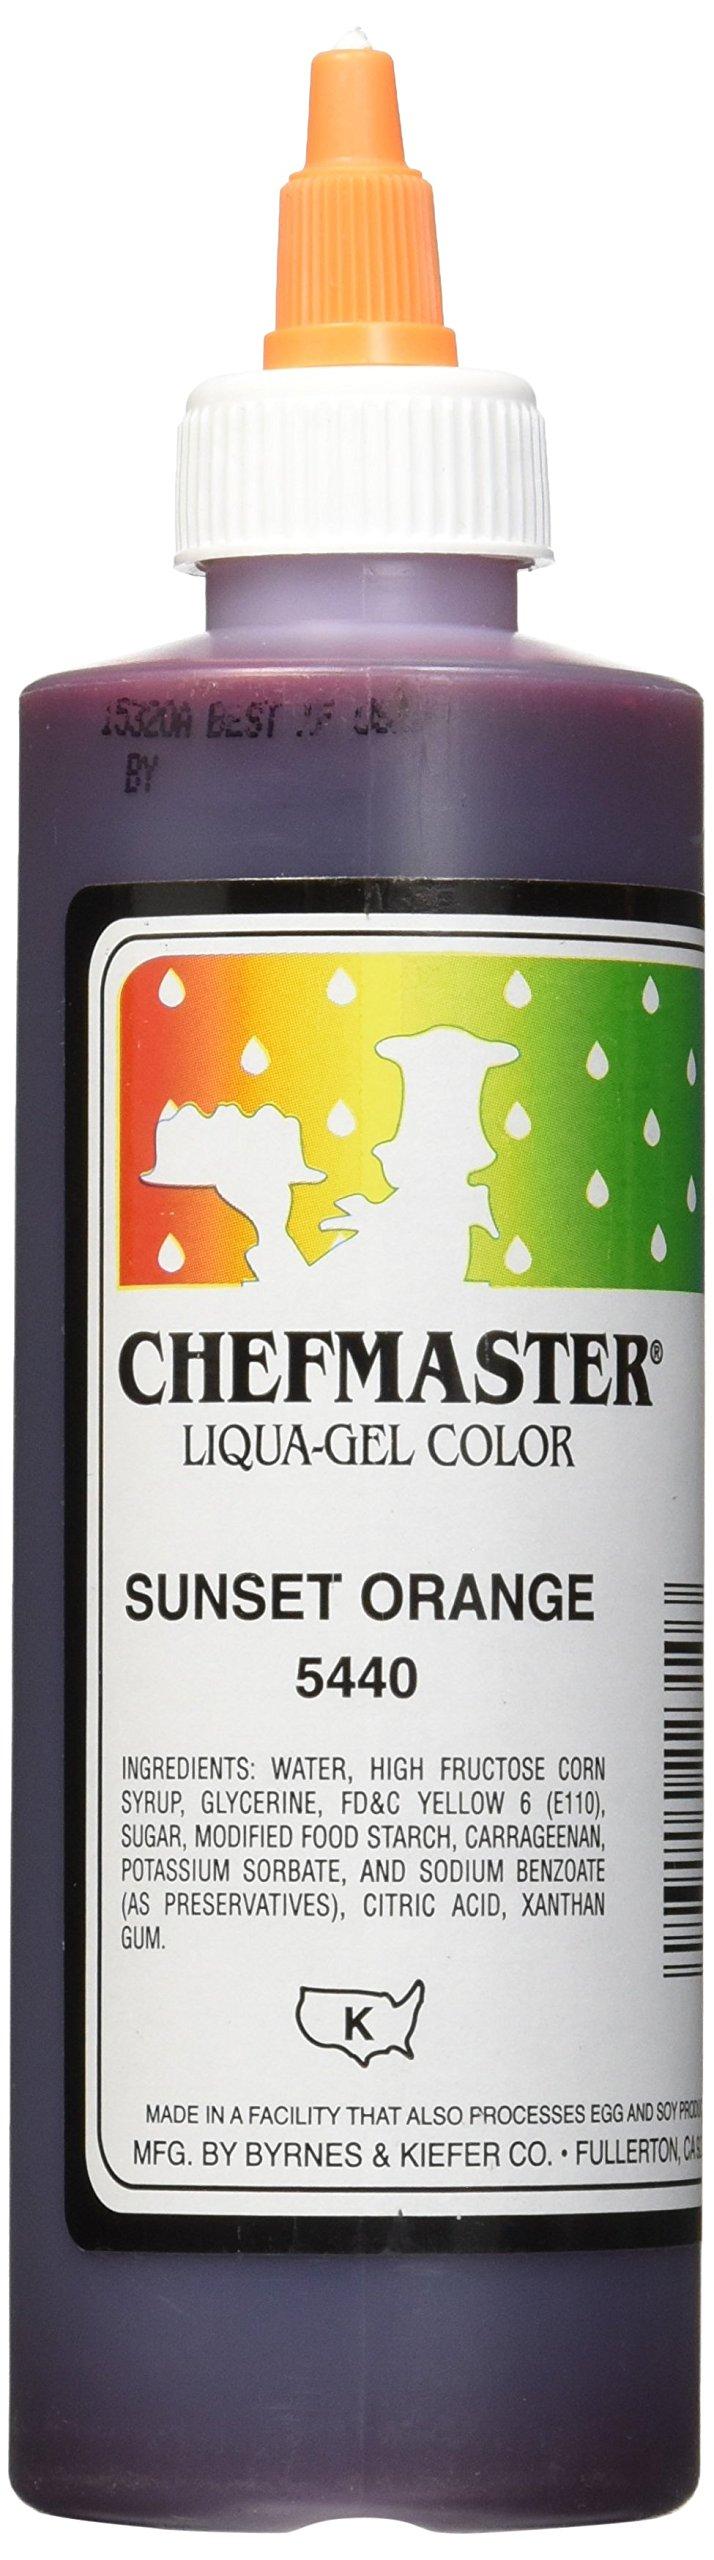 Chefmaster Liqua-Gel Food Color, 10.5-Ounce, Sunset Orange by Chef-Master